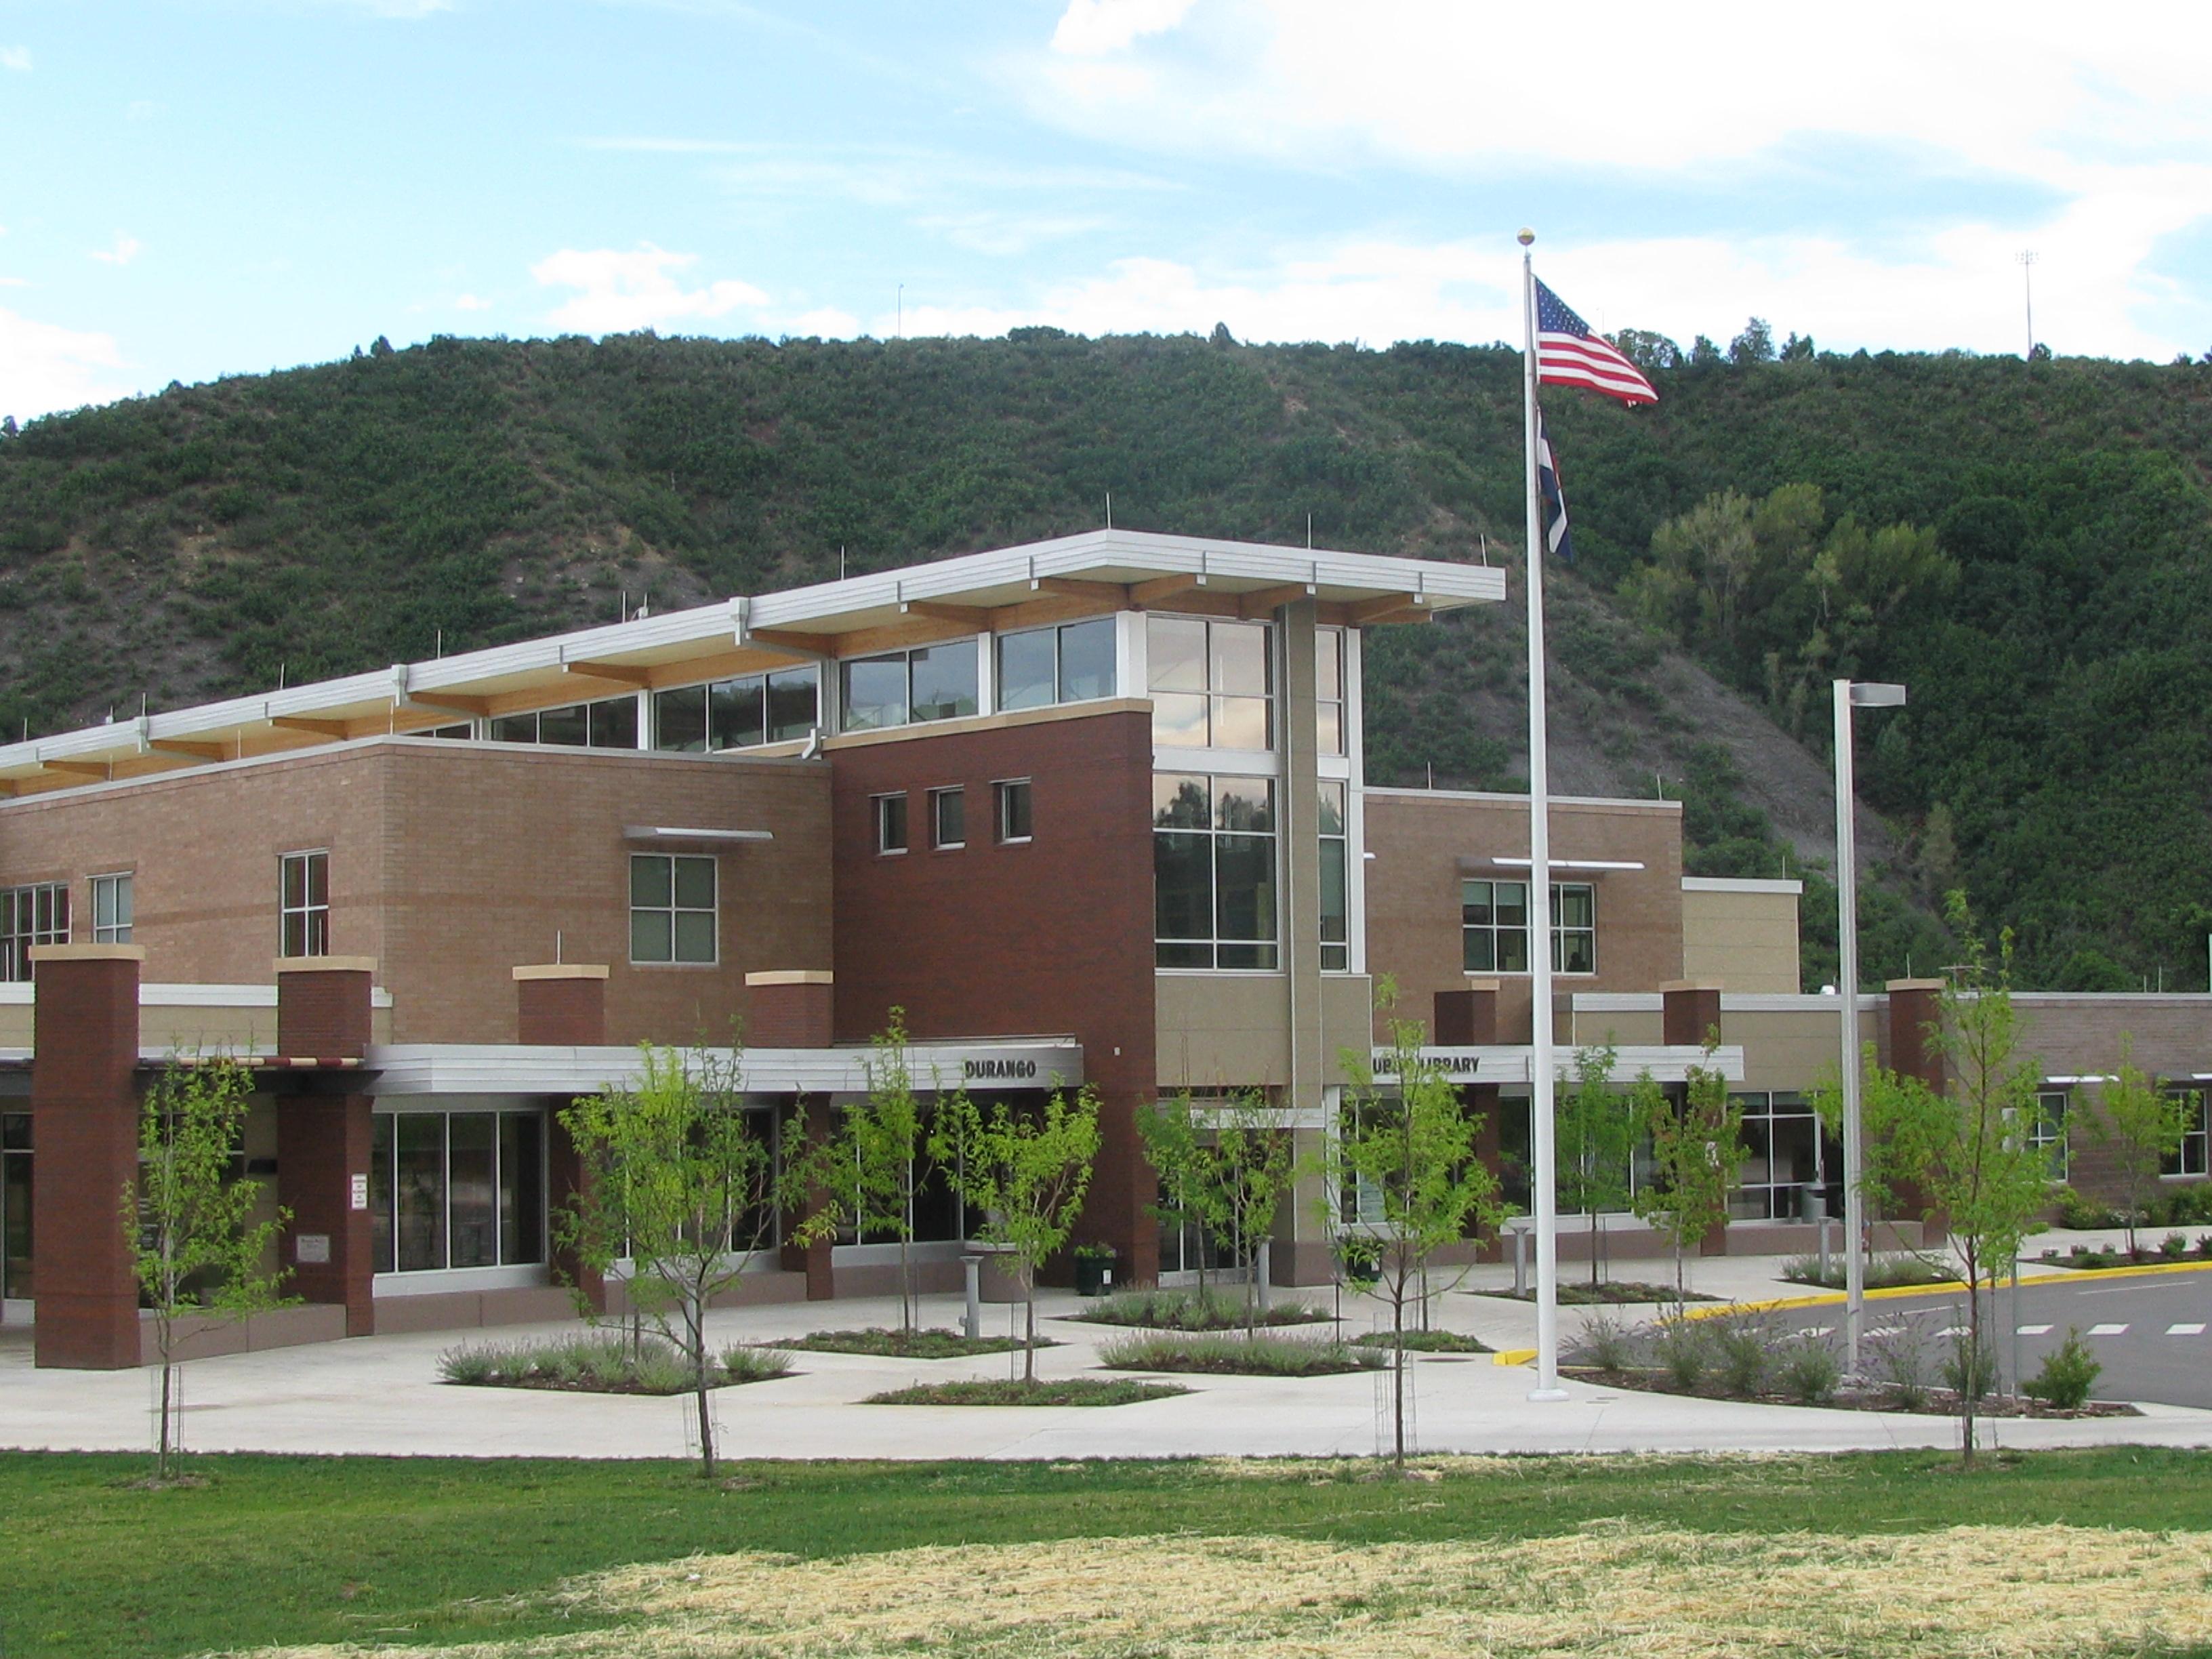 Durango-Lib1